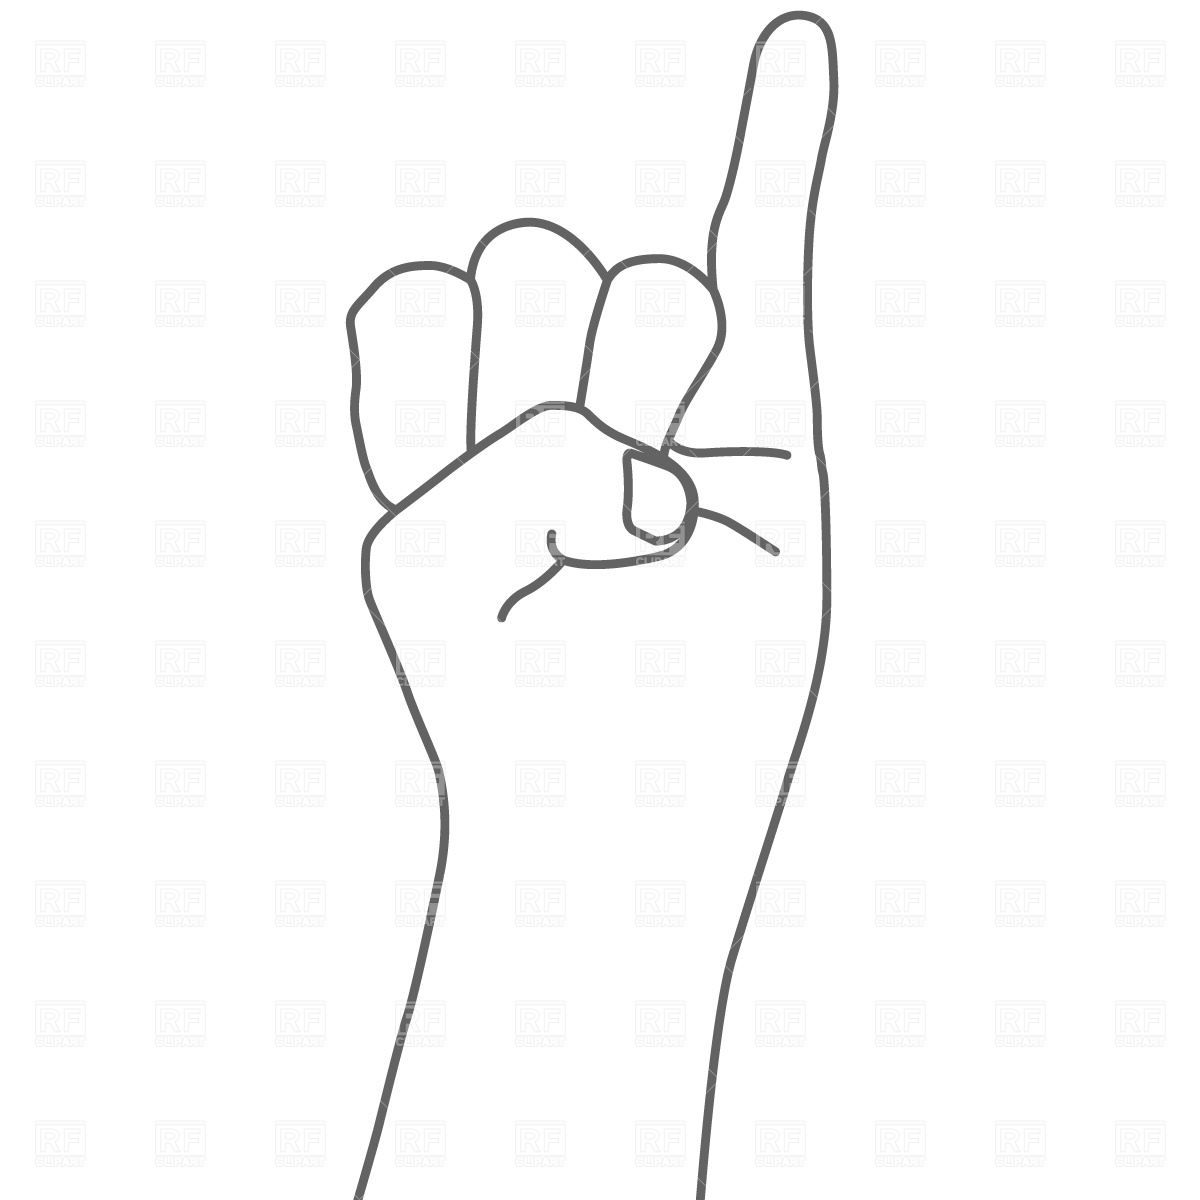 Finger clipart pinkie finger. Pinky portal